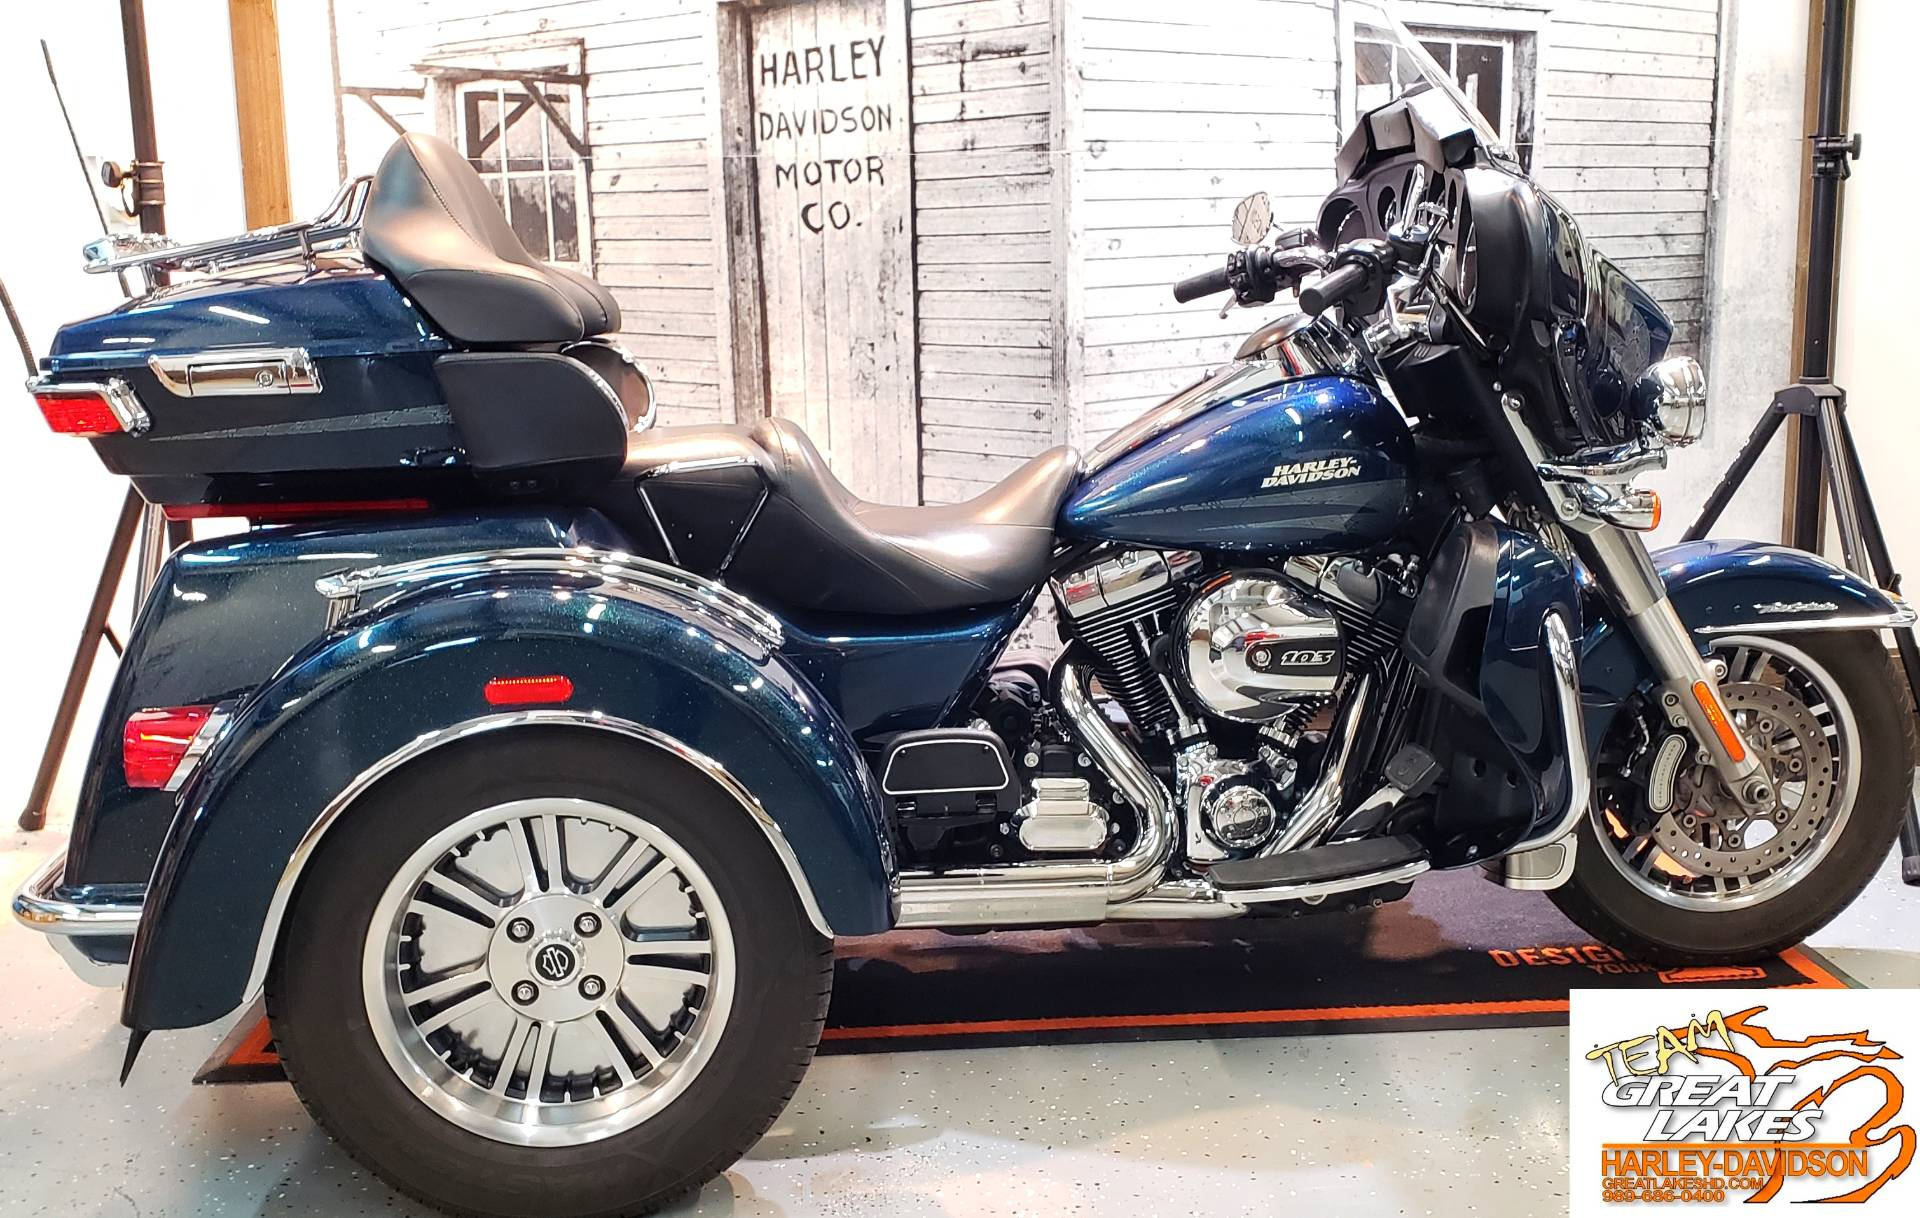 Chrome Three Light Dash Panel Kit,fits Harley Davidson motorcycle models